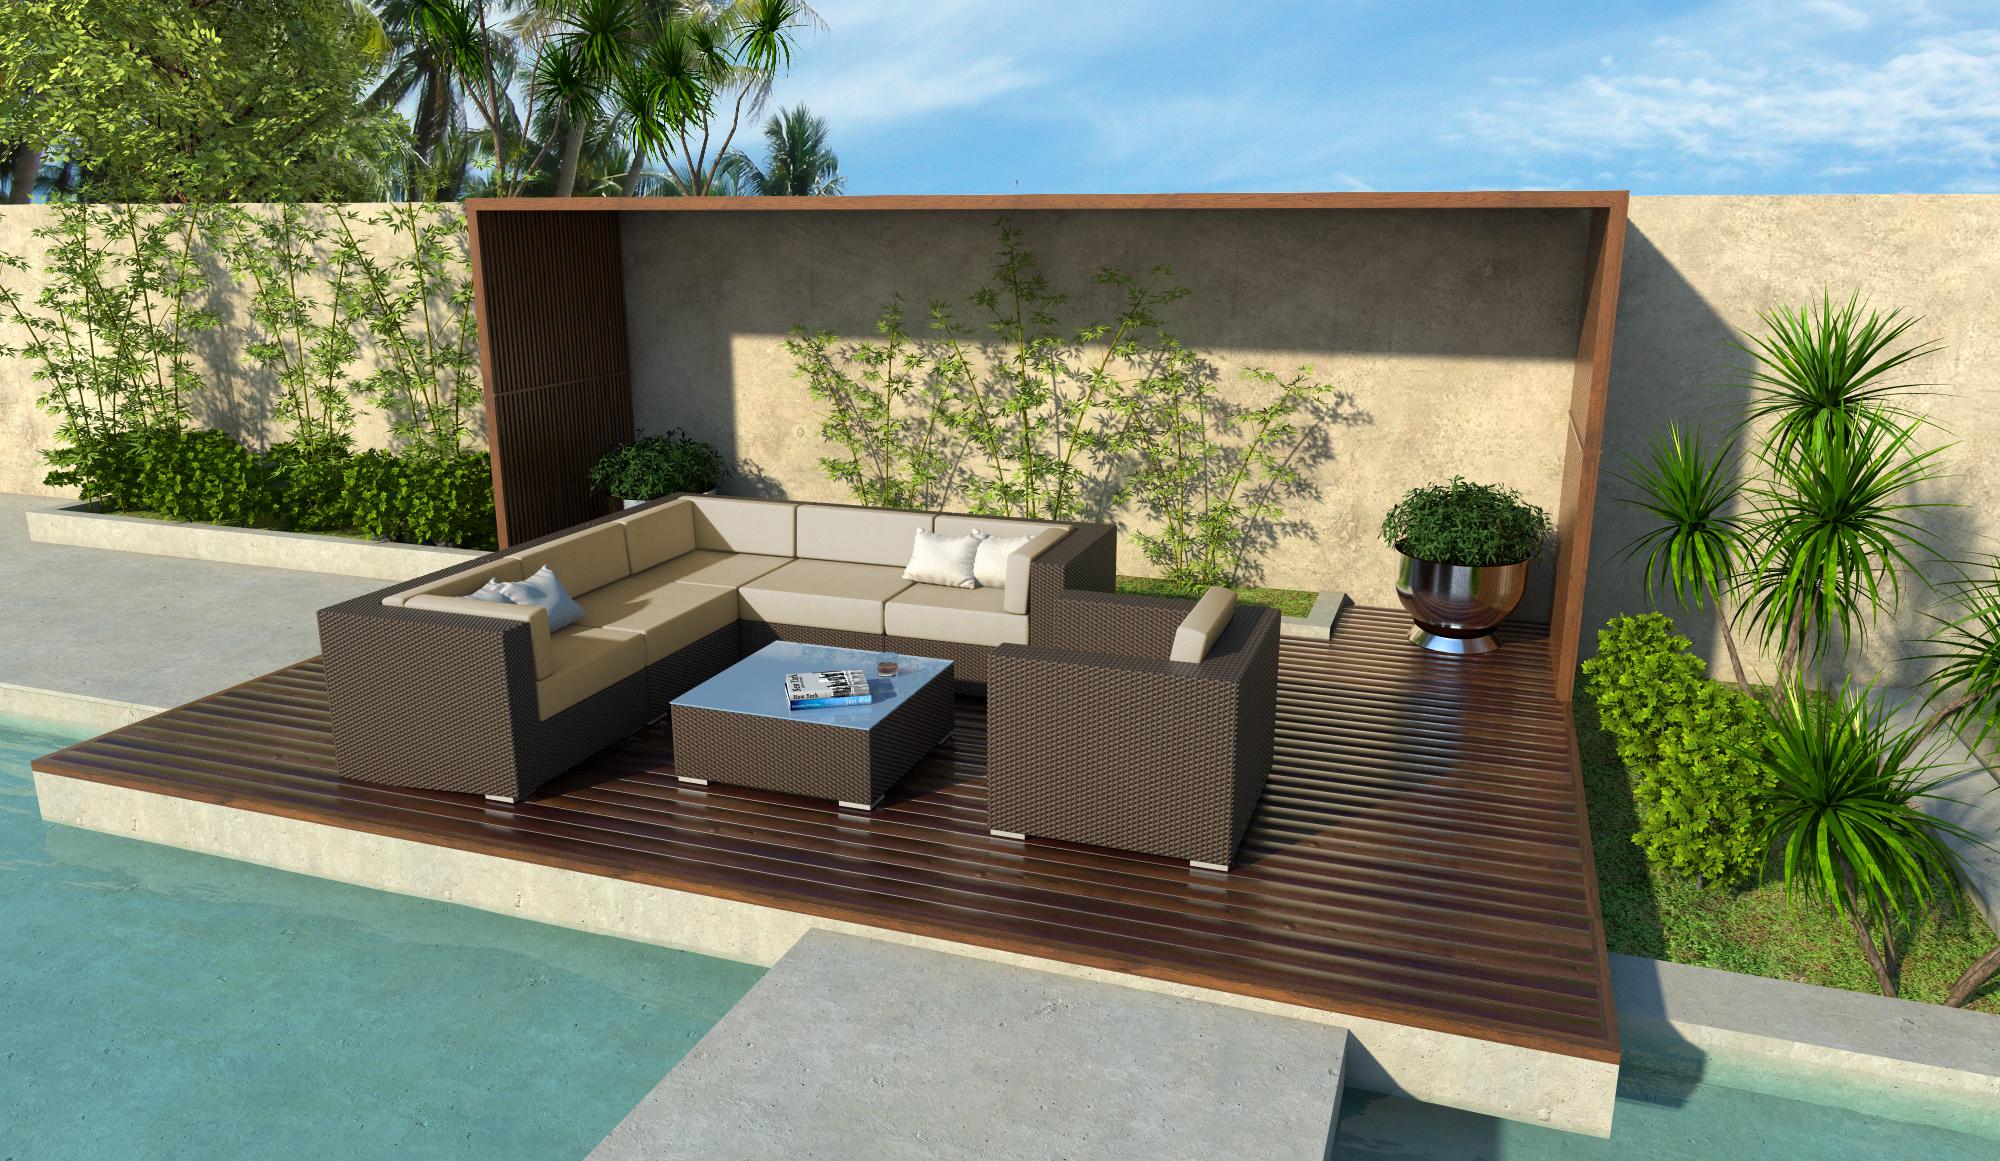 Grant 7 Piece Wicker Patio Sofa Sectional Set